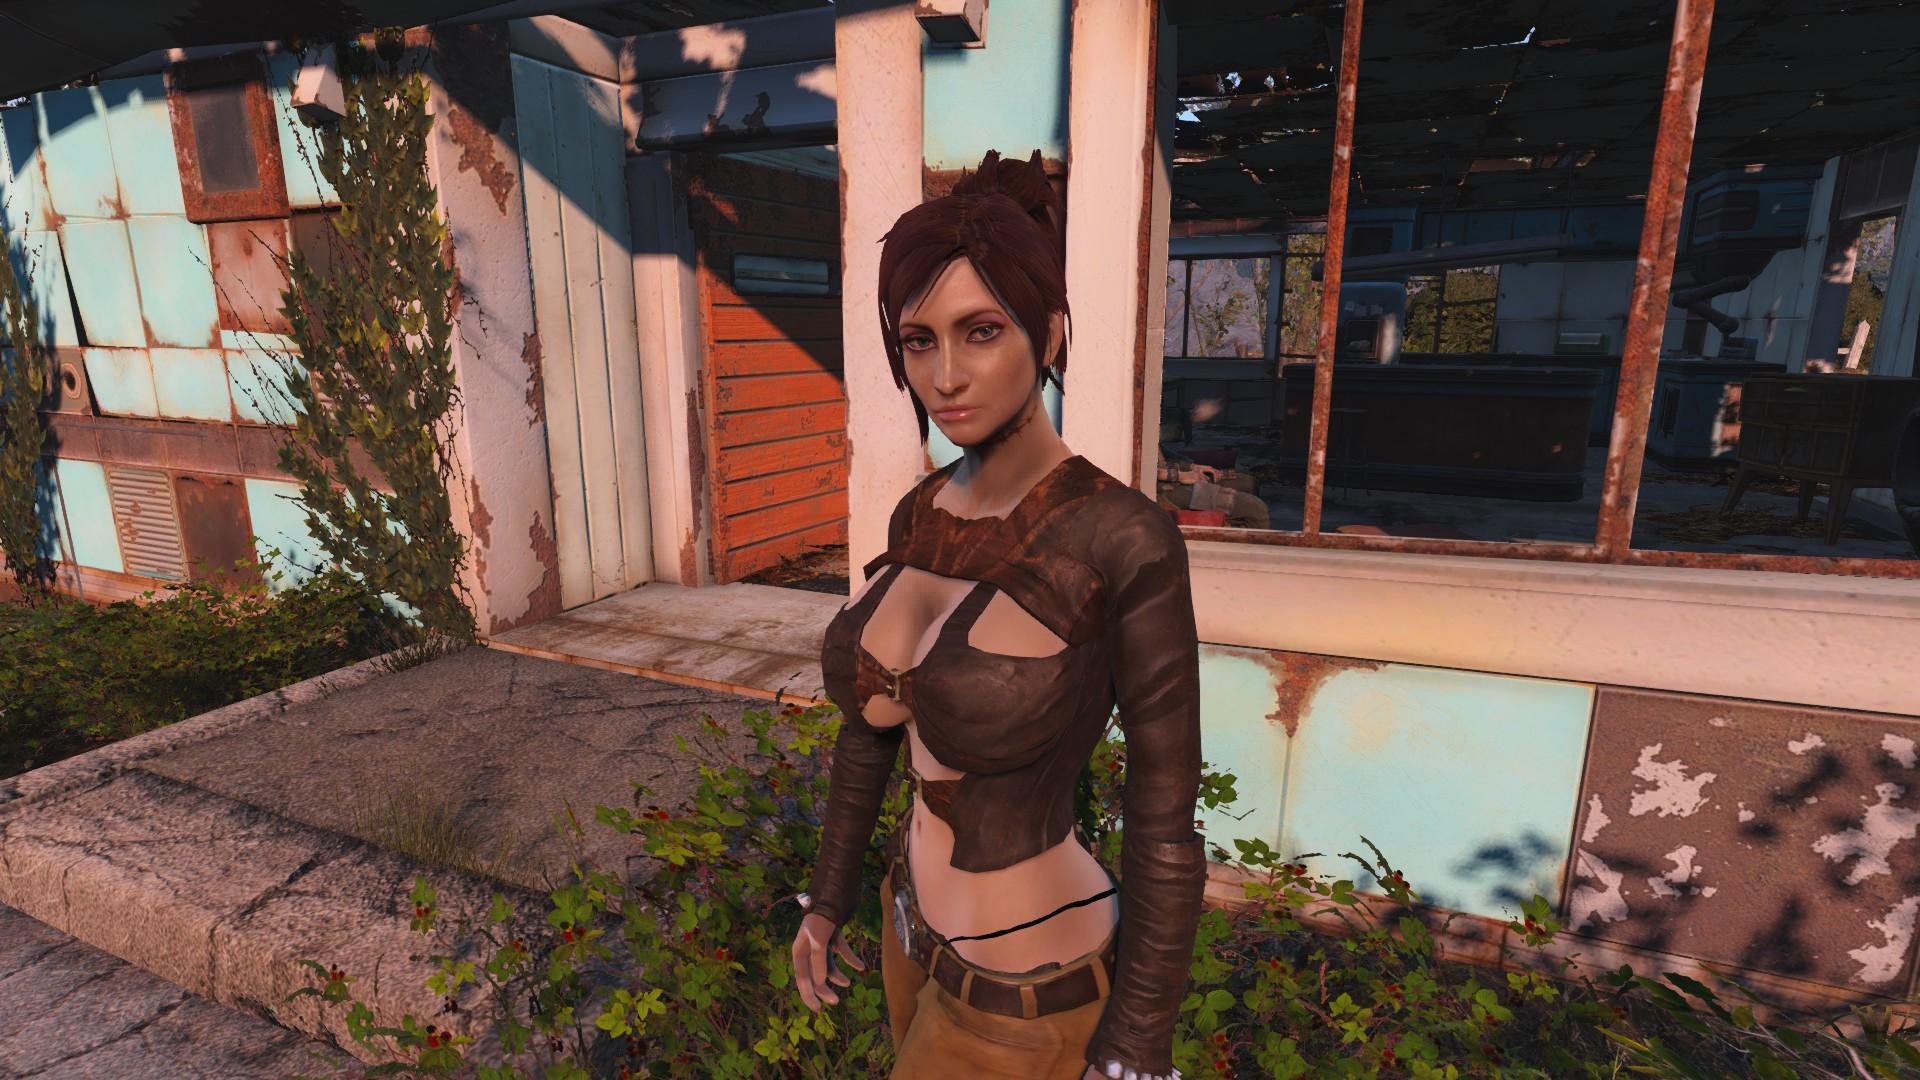 Fallout cait sex mod erotica gallery